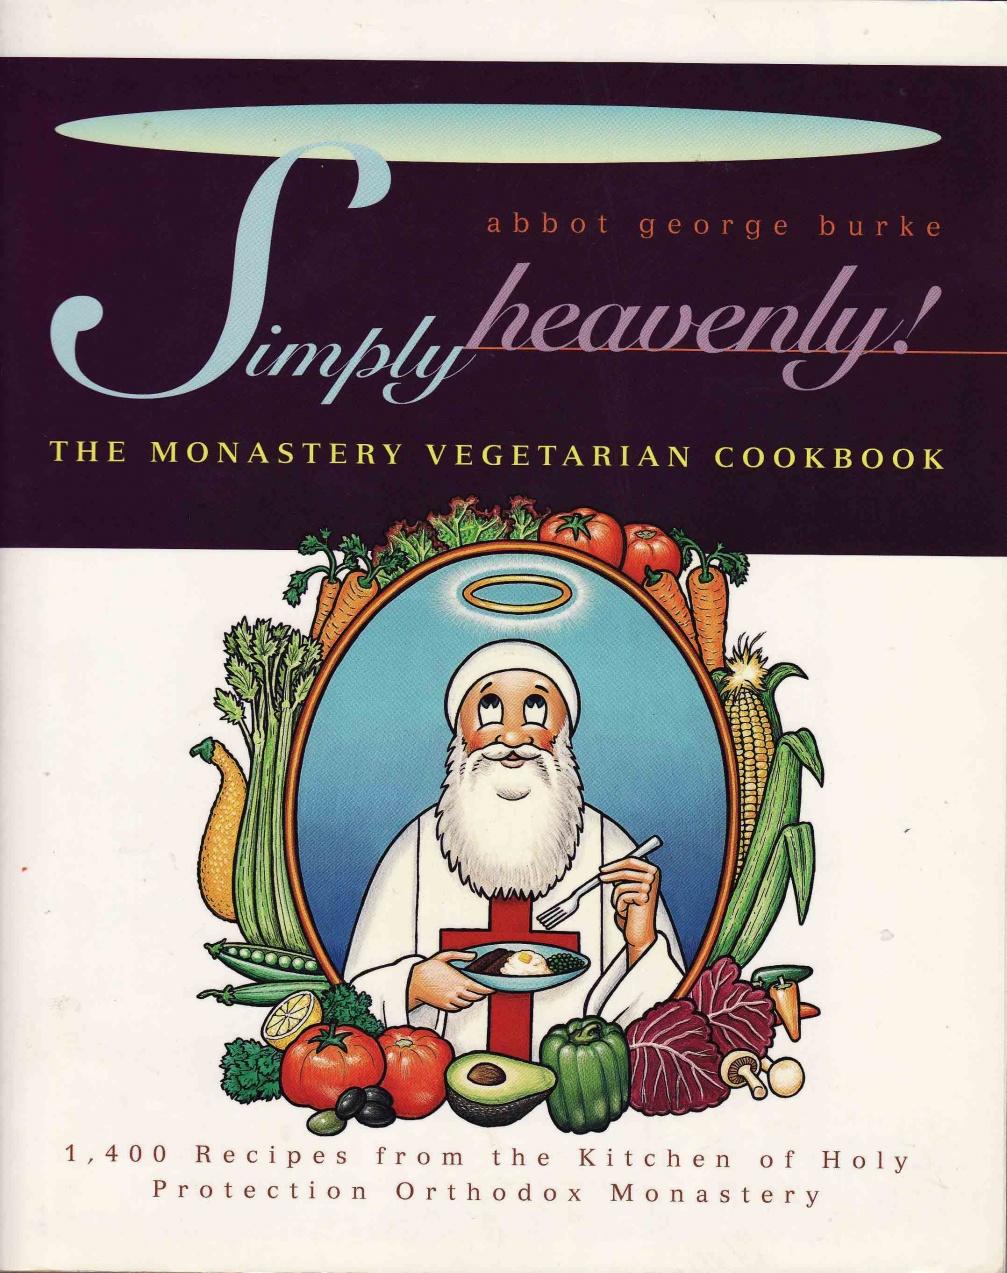 Click image for larger version  Name:cookbook.jpg Views:162 Size:421.8 KB ID:36175